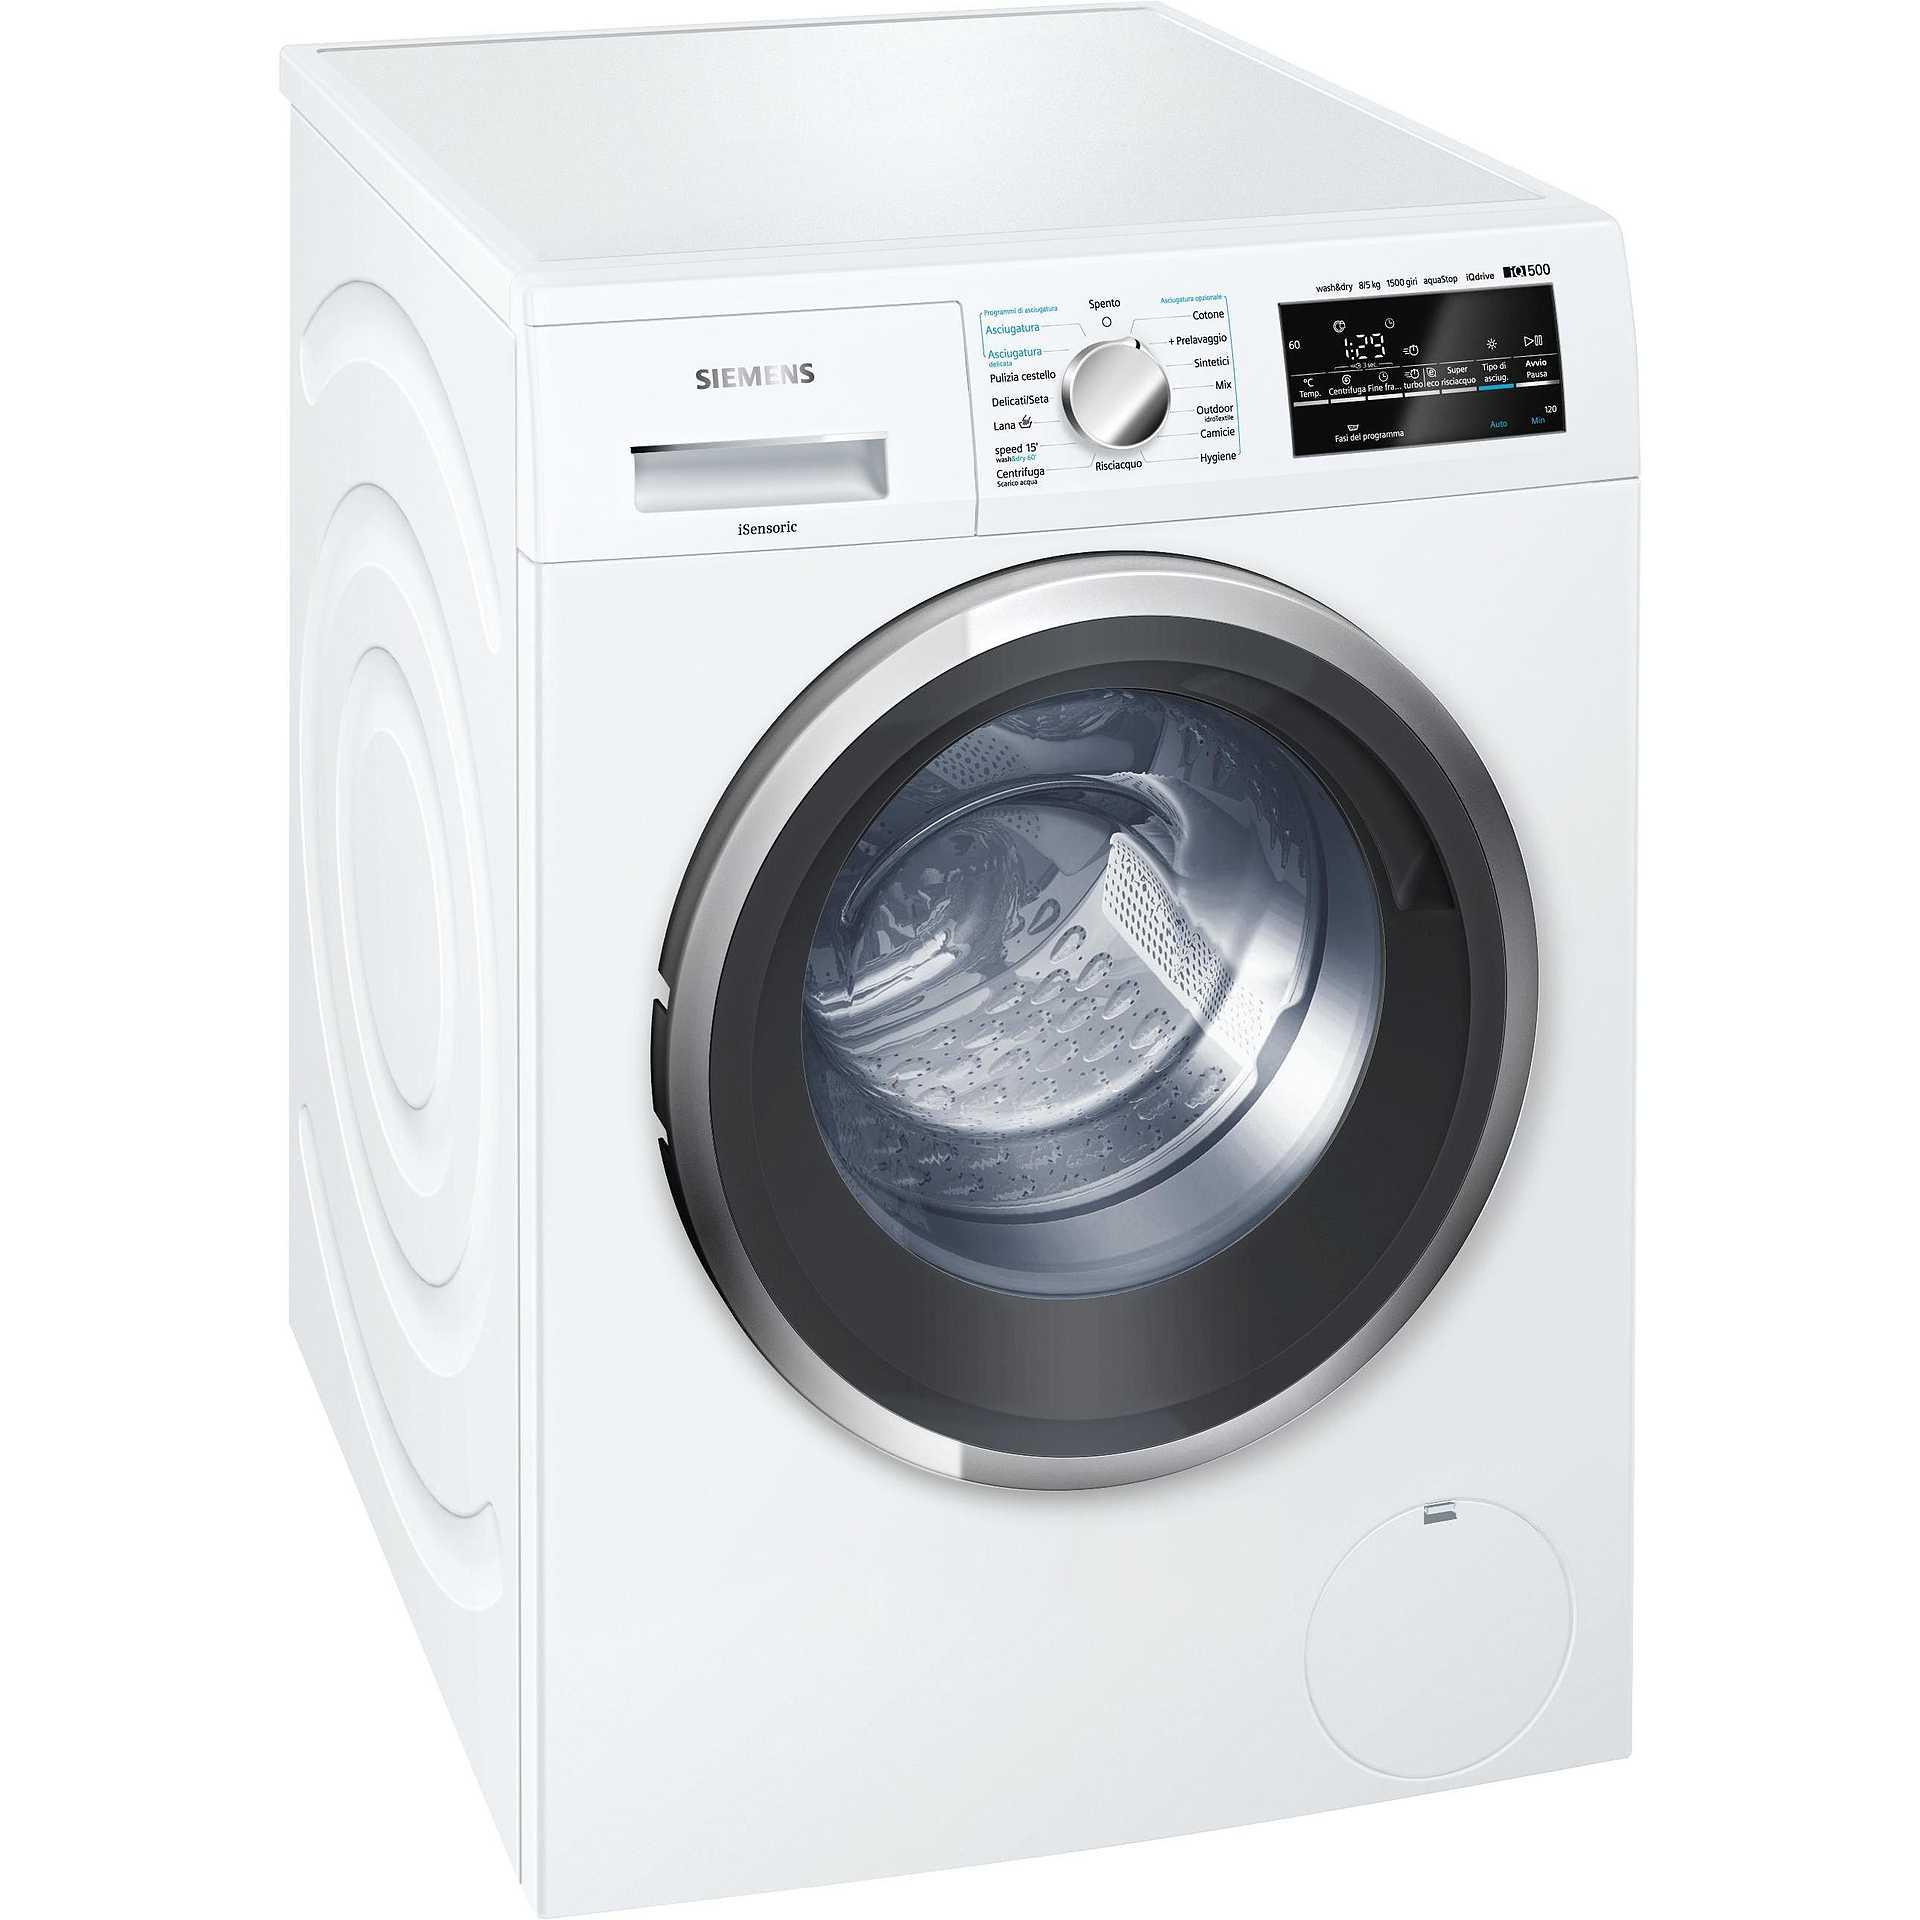 Assistenza lavasciuga Siemens Urgnano